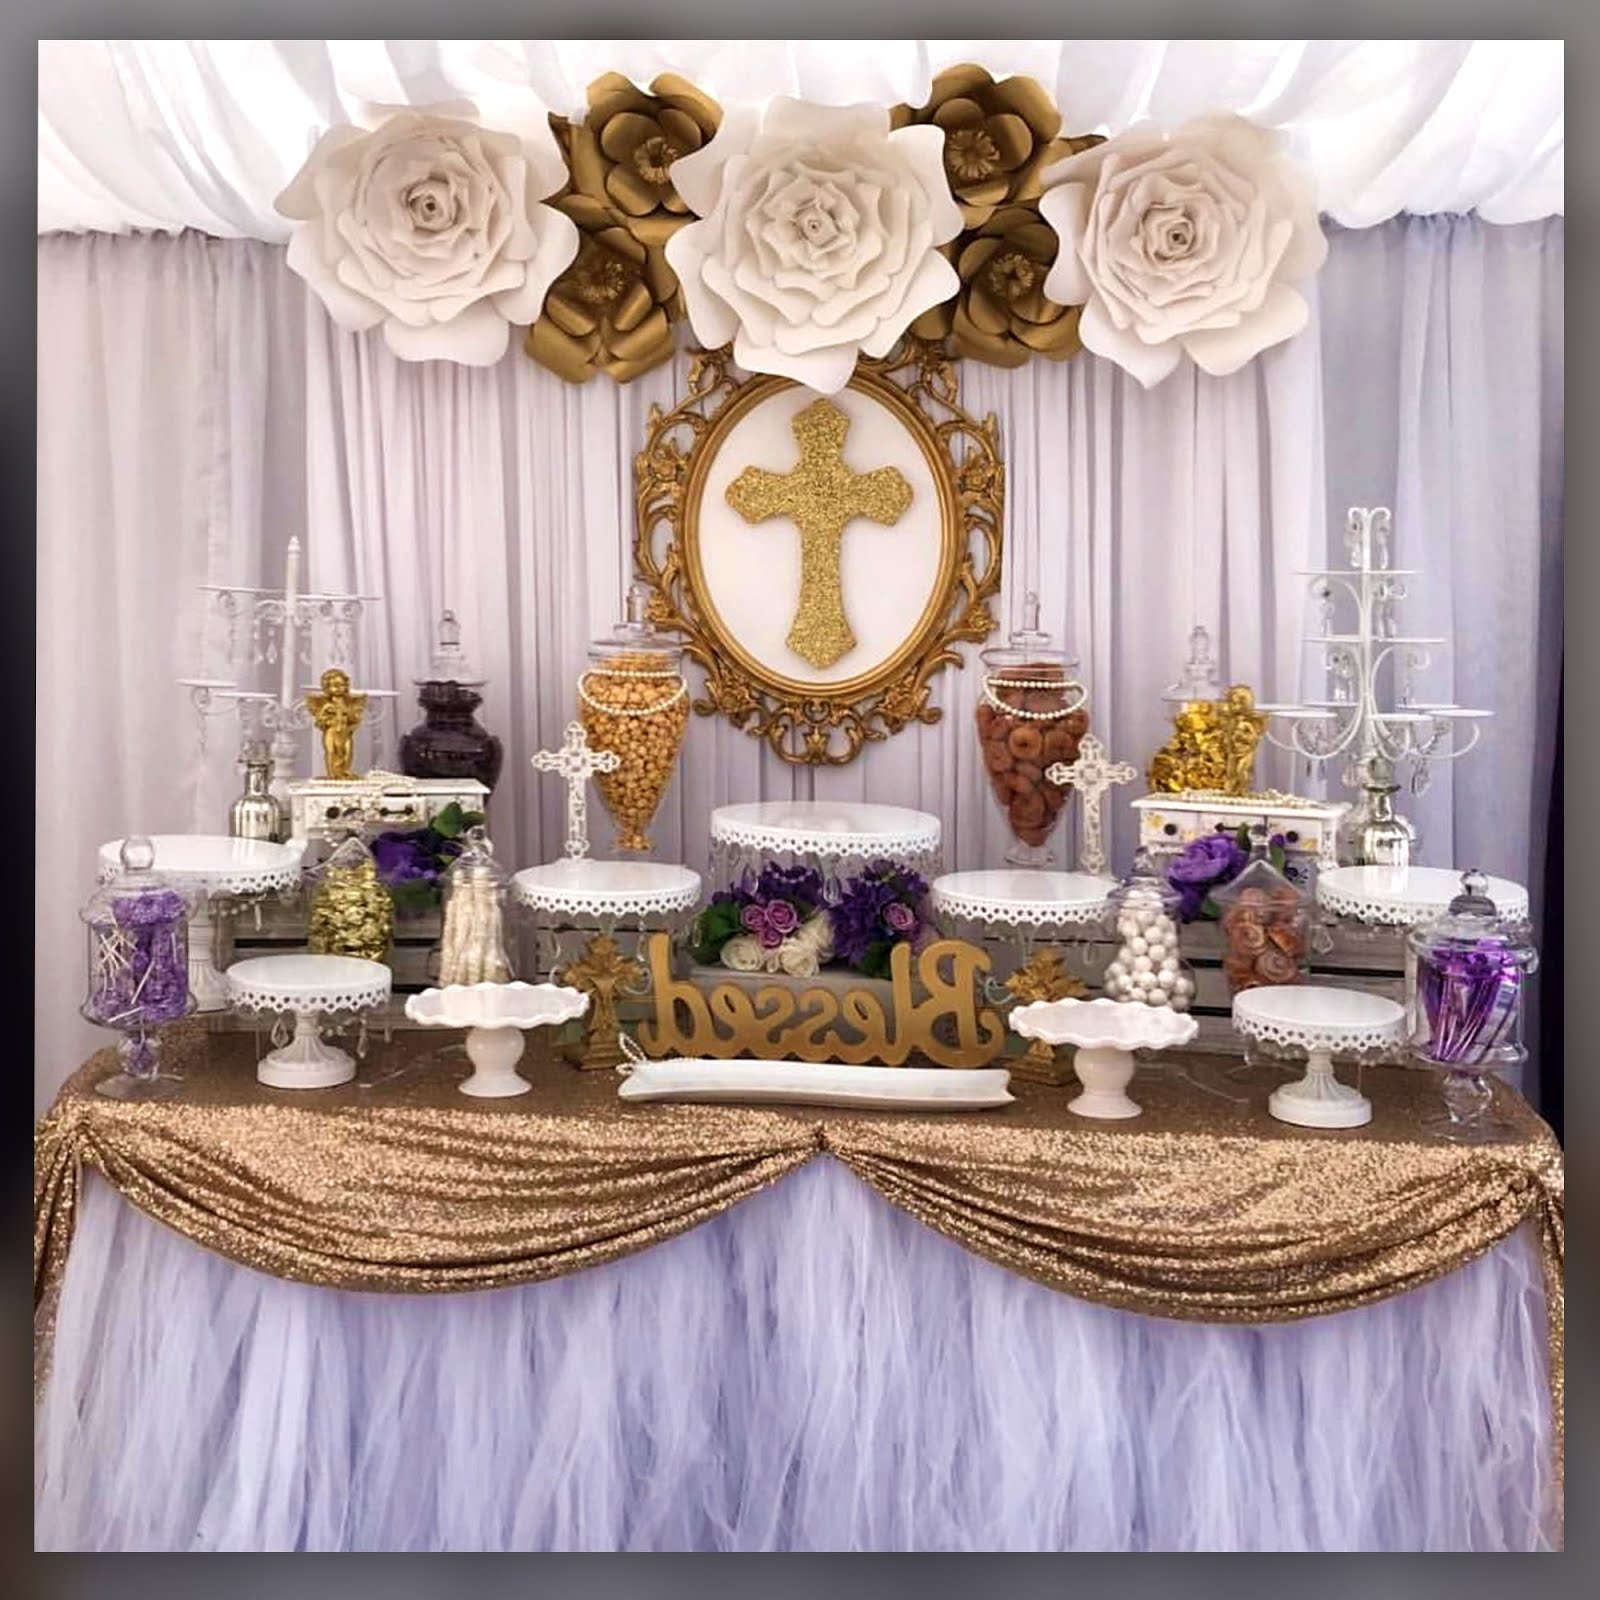 decoracion de primera comunion